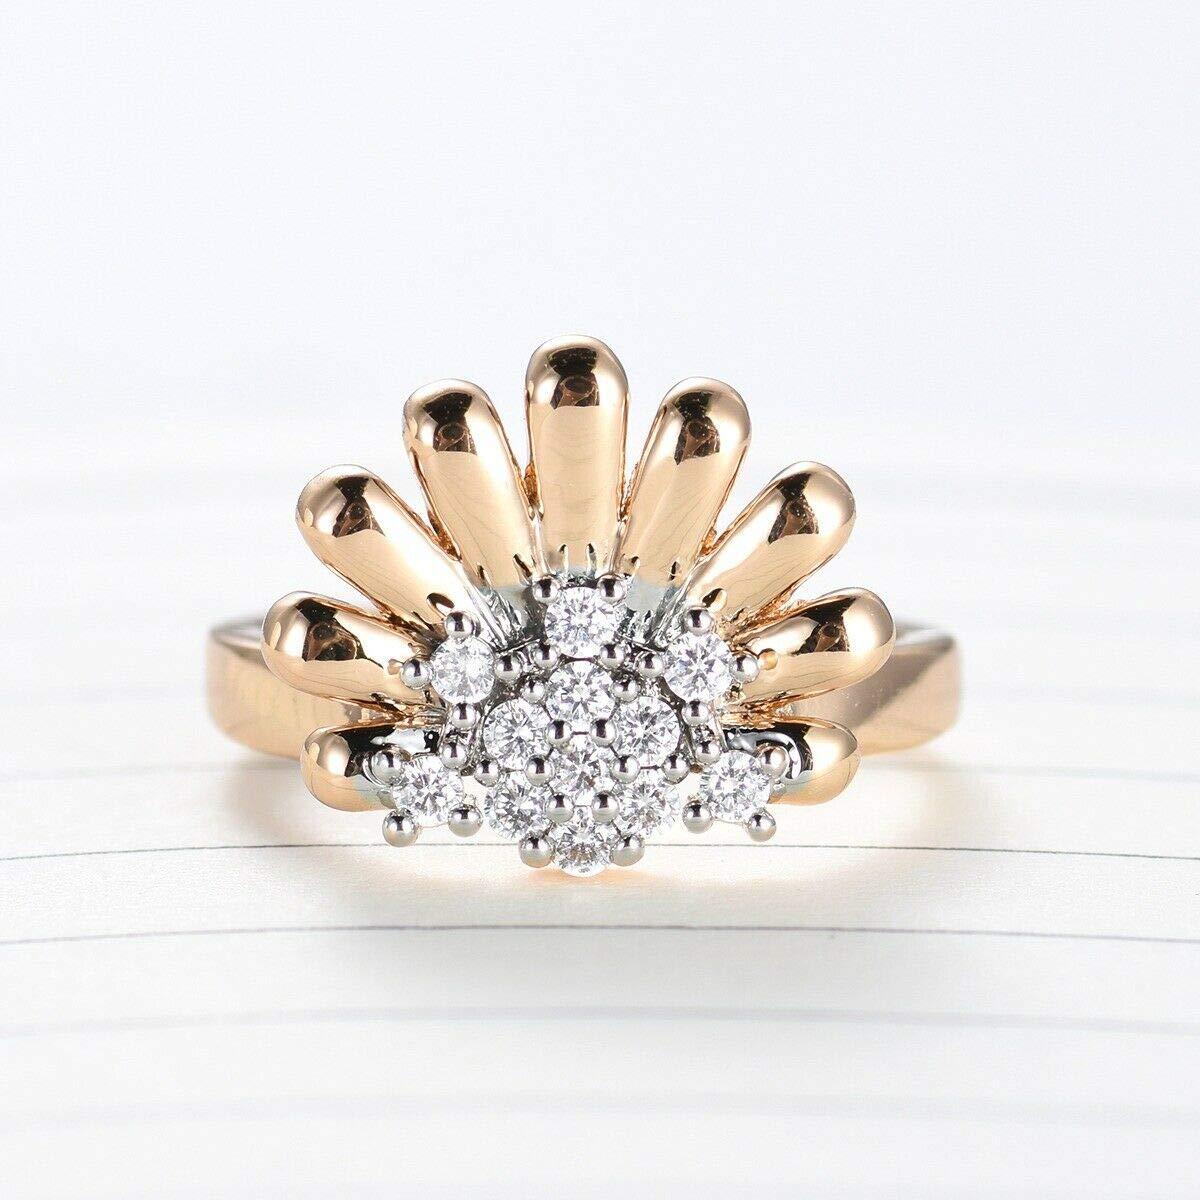 Jewelryamintra Lady Daisy Topaz Crystal Rhinestone 18K Gold Platinum Filled Cluster Ring Gift 9